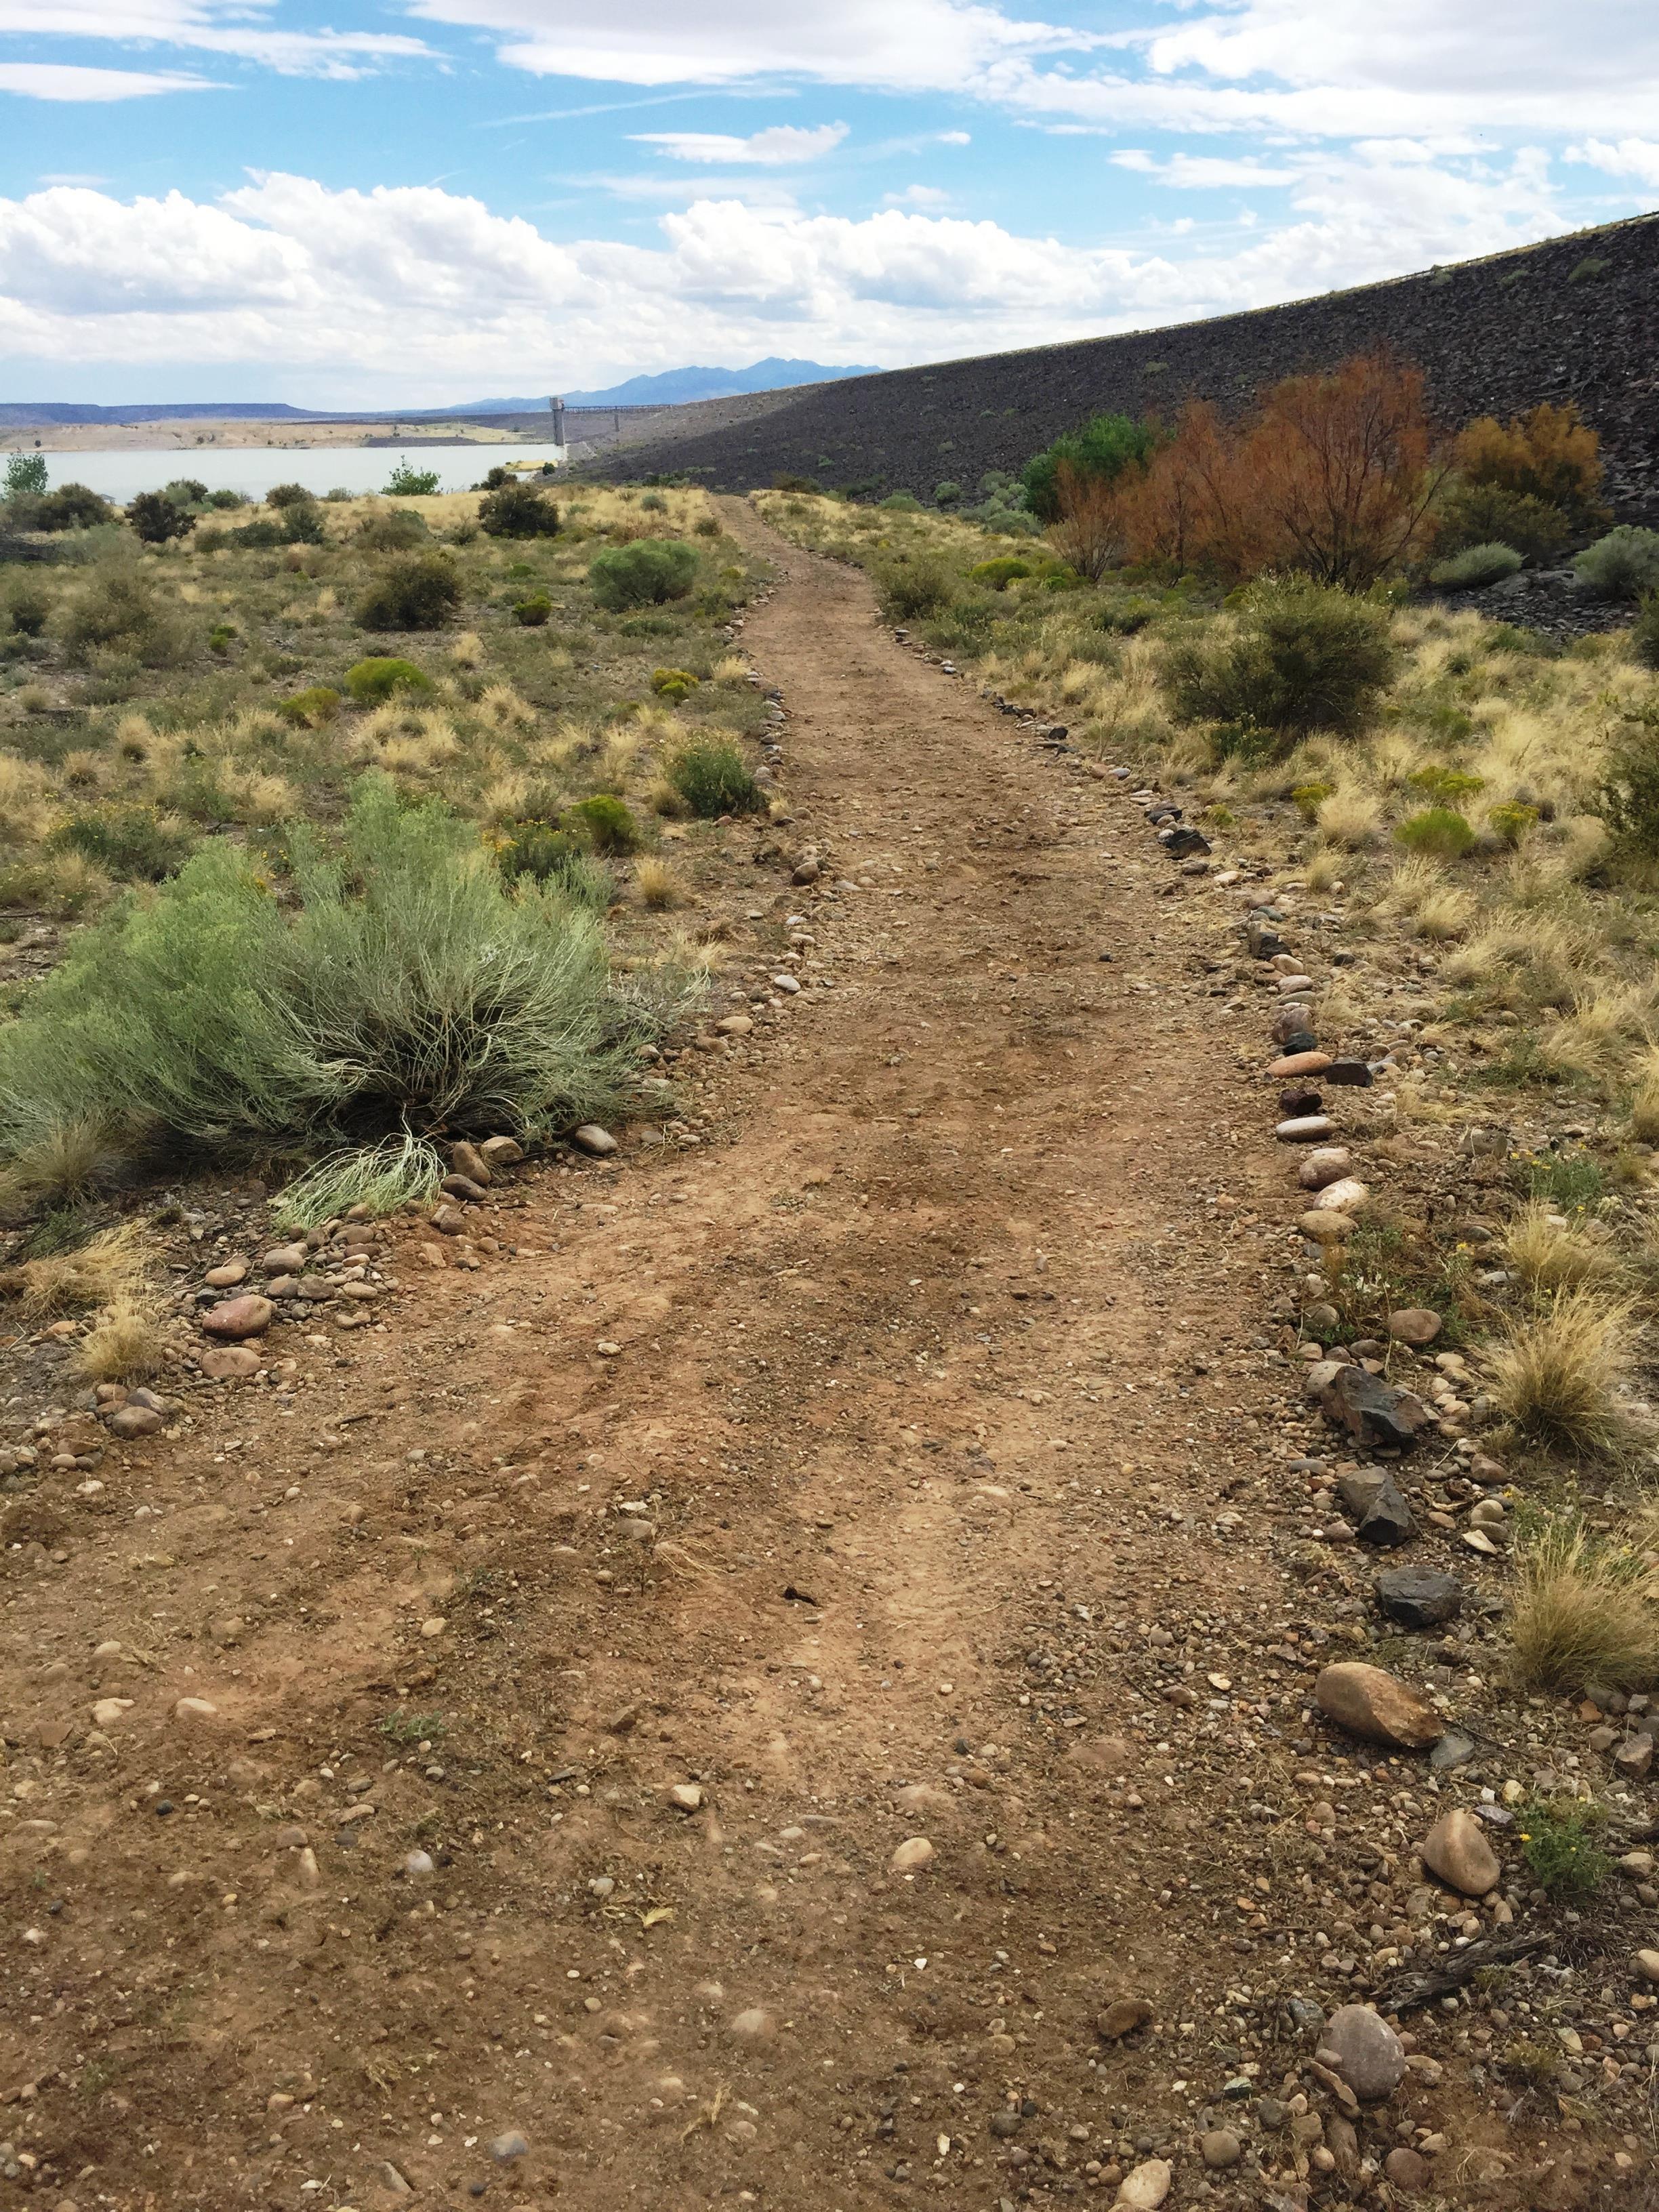 Volunteers Build Trails At Cochiti Lake Albuquerque District Albuquerque District News Stories